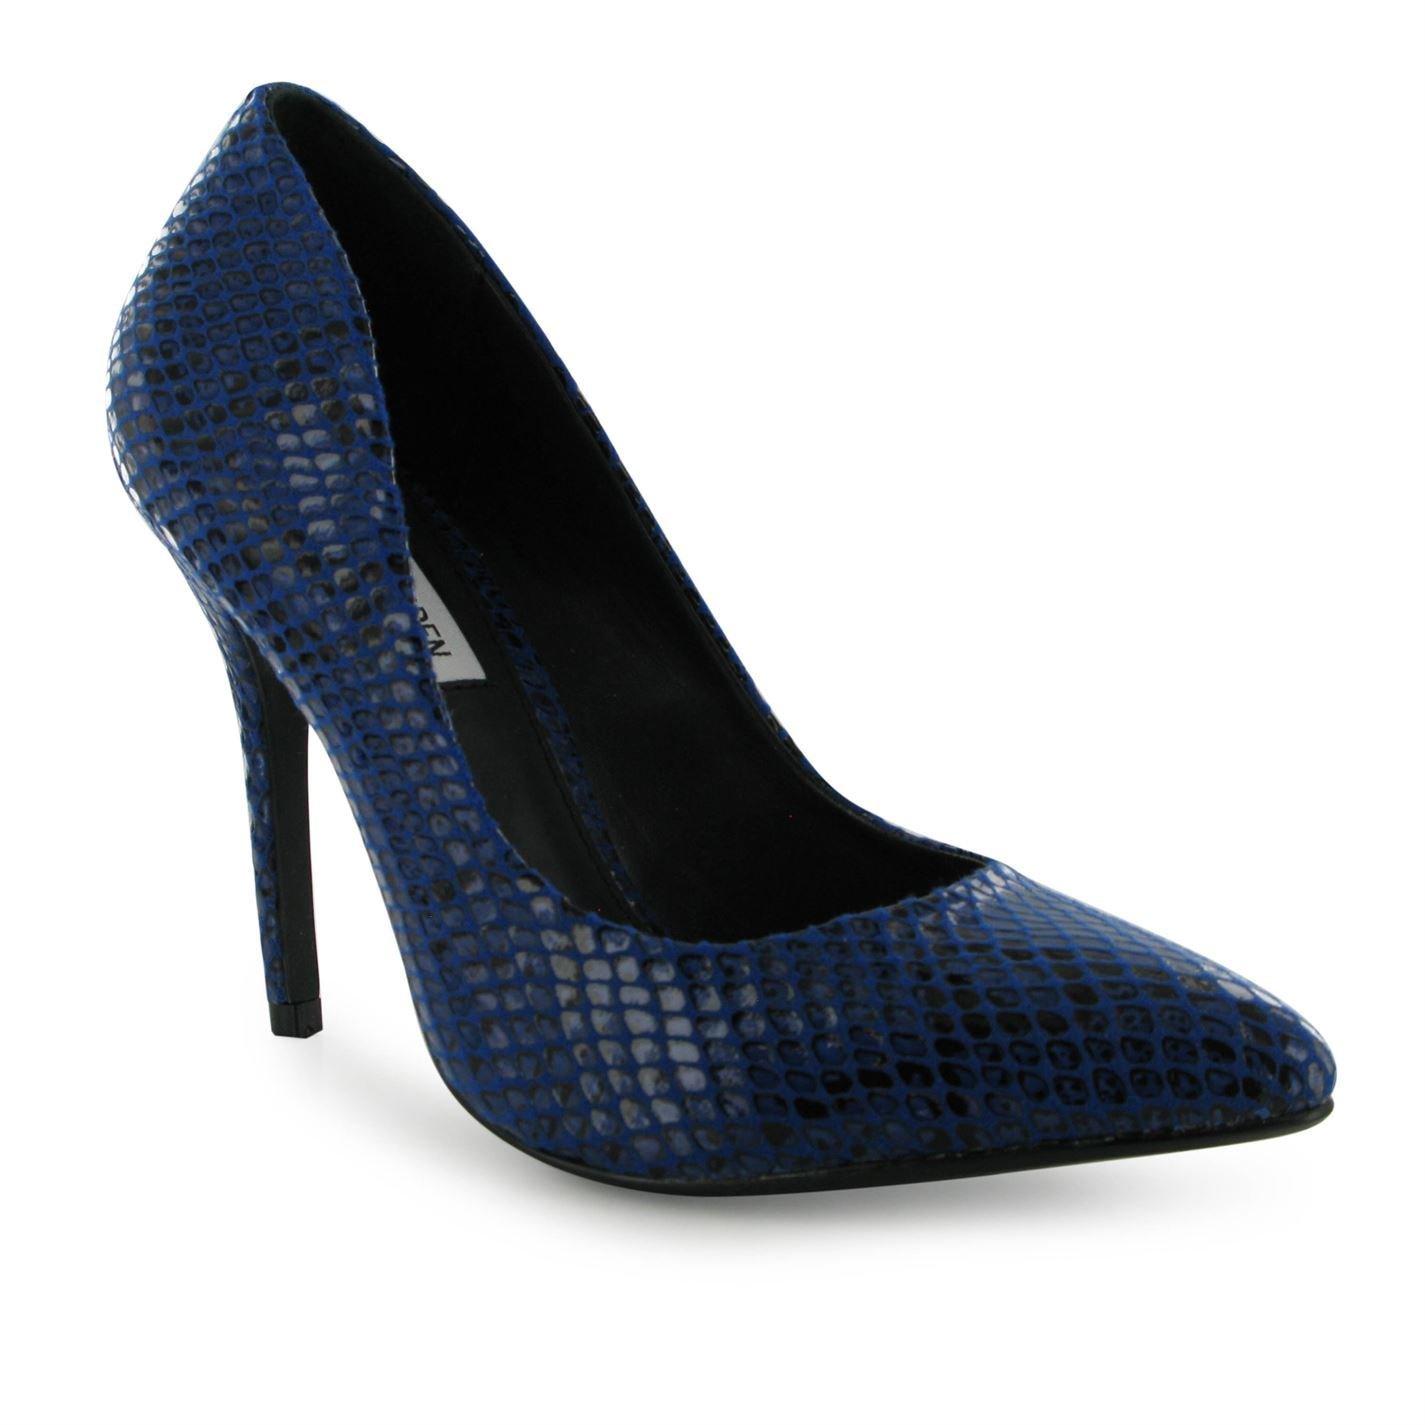 Steve Heel Madden Galerie Stiletto Heel Steve Schuhes Damen blau Damen Mode Schuhe - e8c1d2